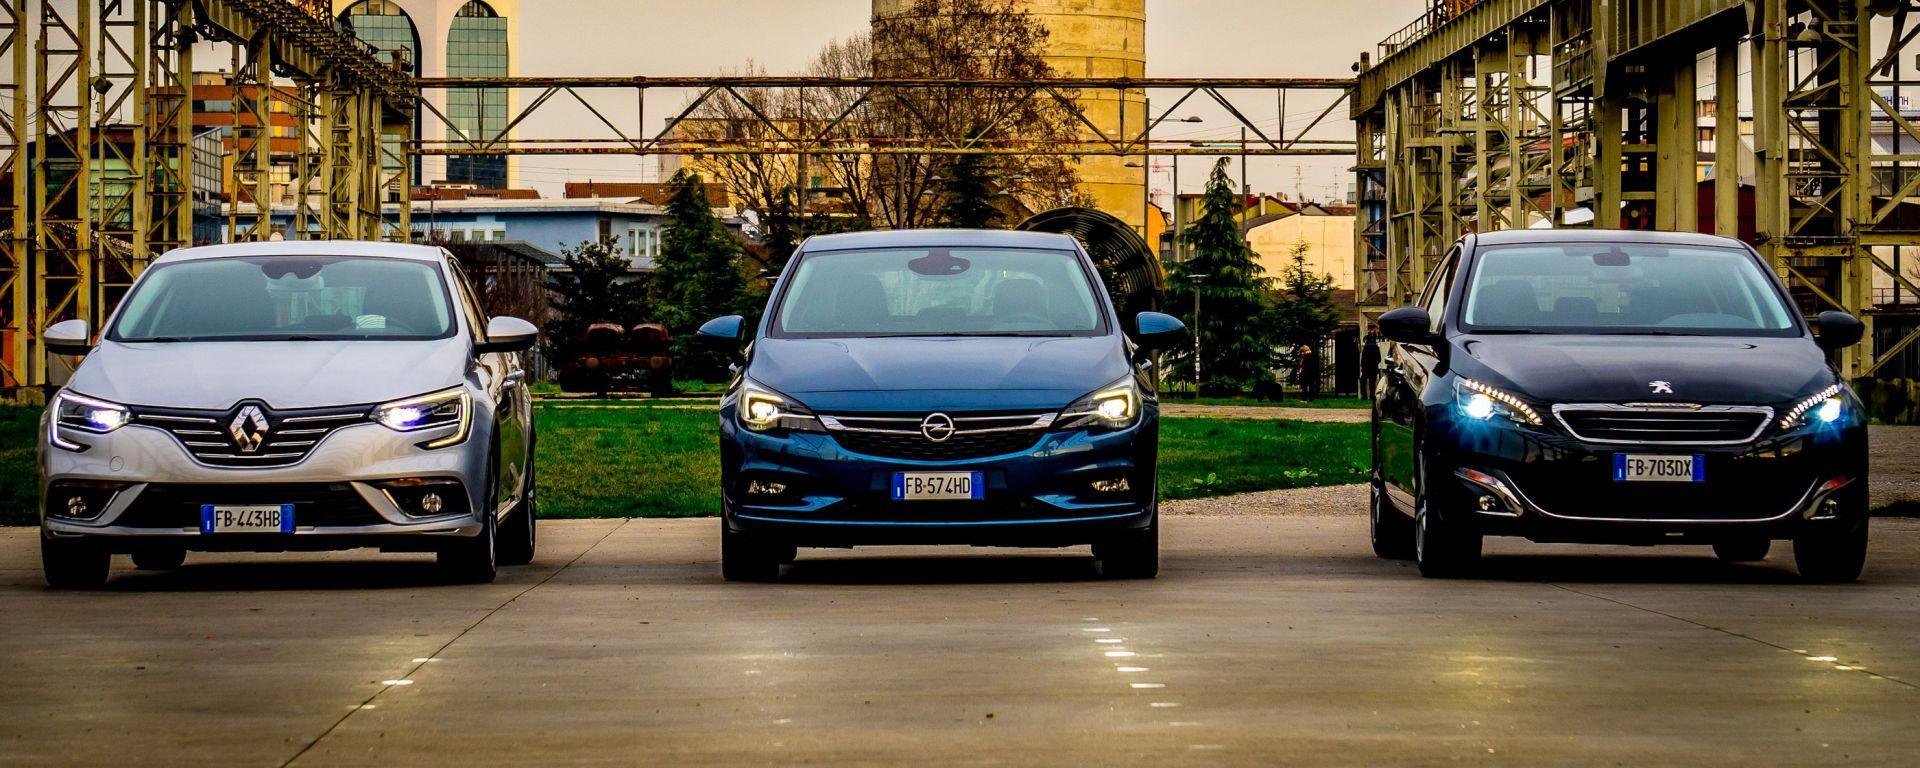 Opel Astra vs Peugeot 308 vs Renault Megane